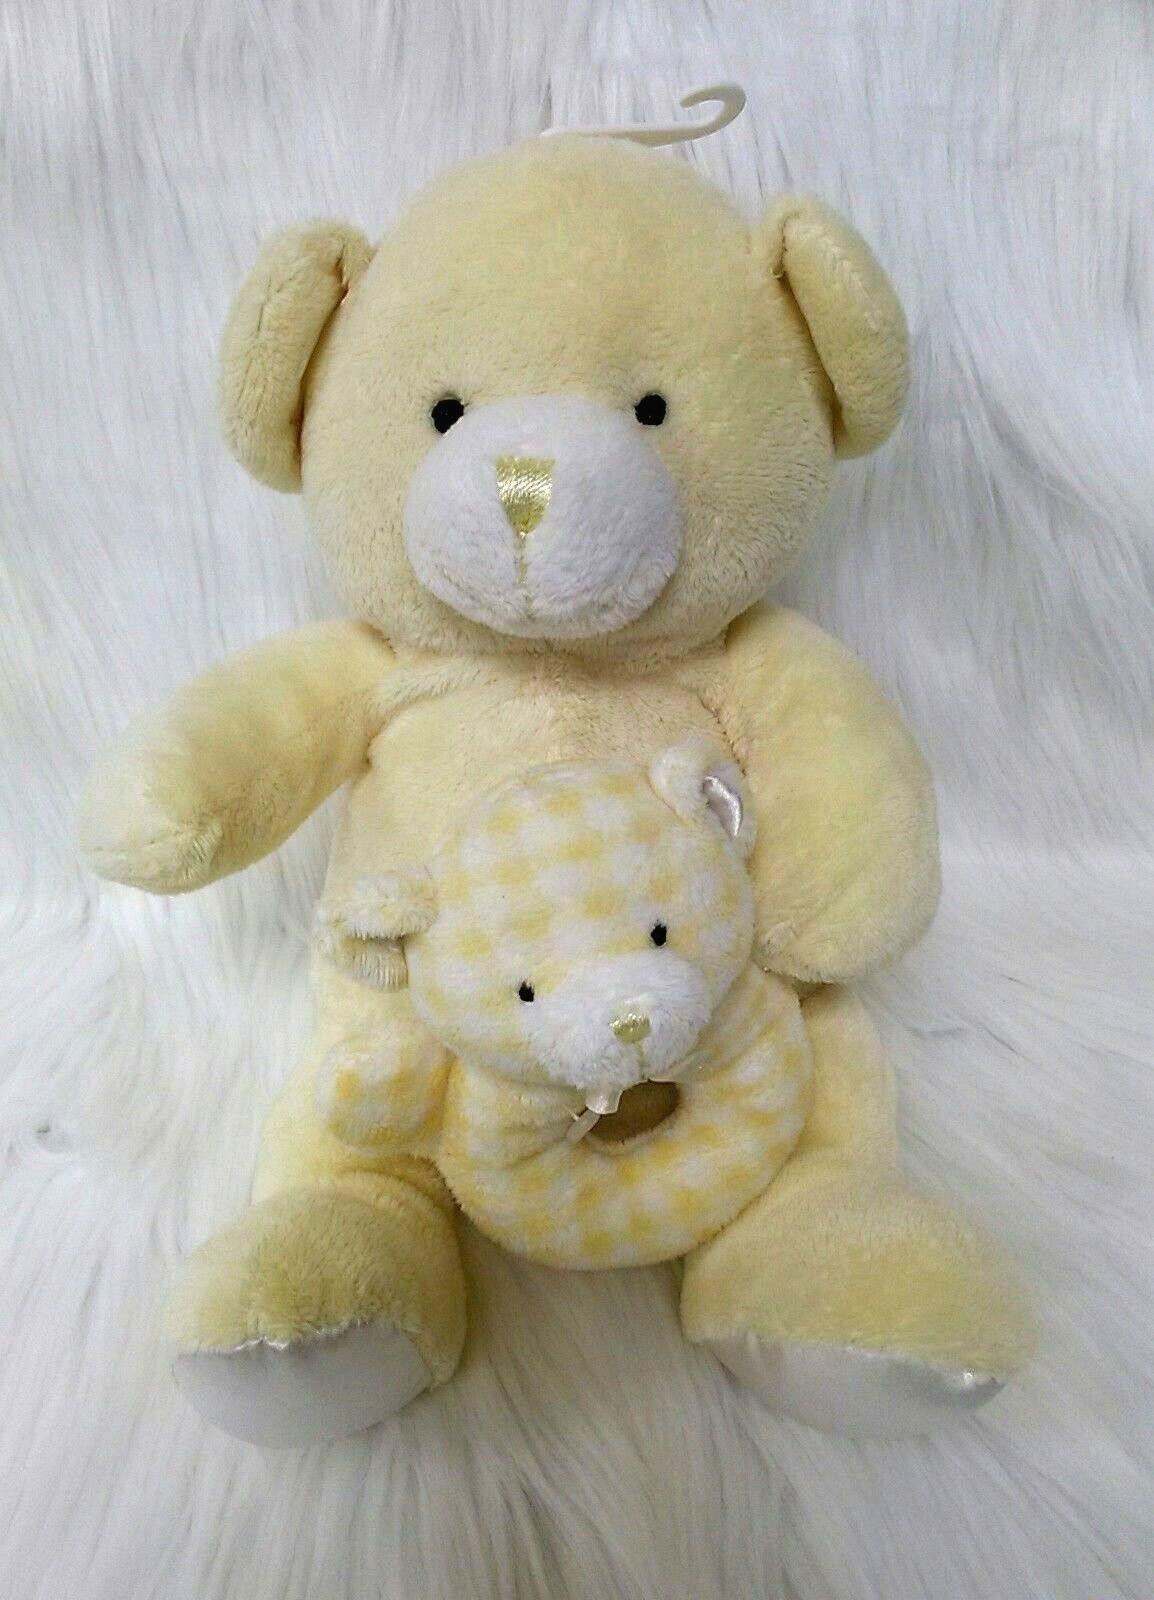 Kids Preferred Bear w Baby Hand Rattle Lovey Yellow Lovey Plush Stuffed Toy B205